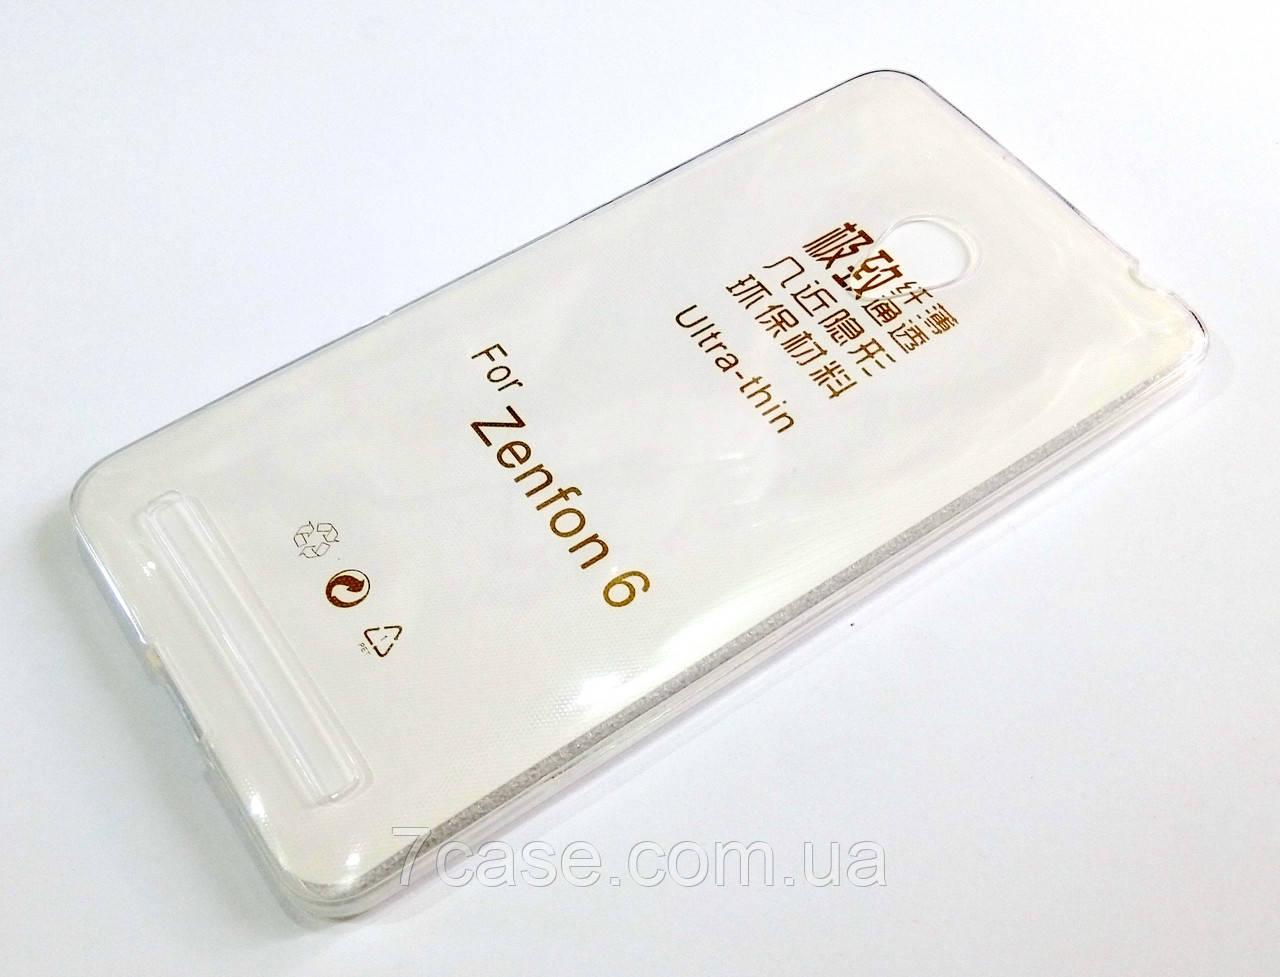 Чохол силіконовий ультратонкий для Asus Zenfone 6 a600cg / a601cg